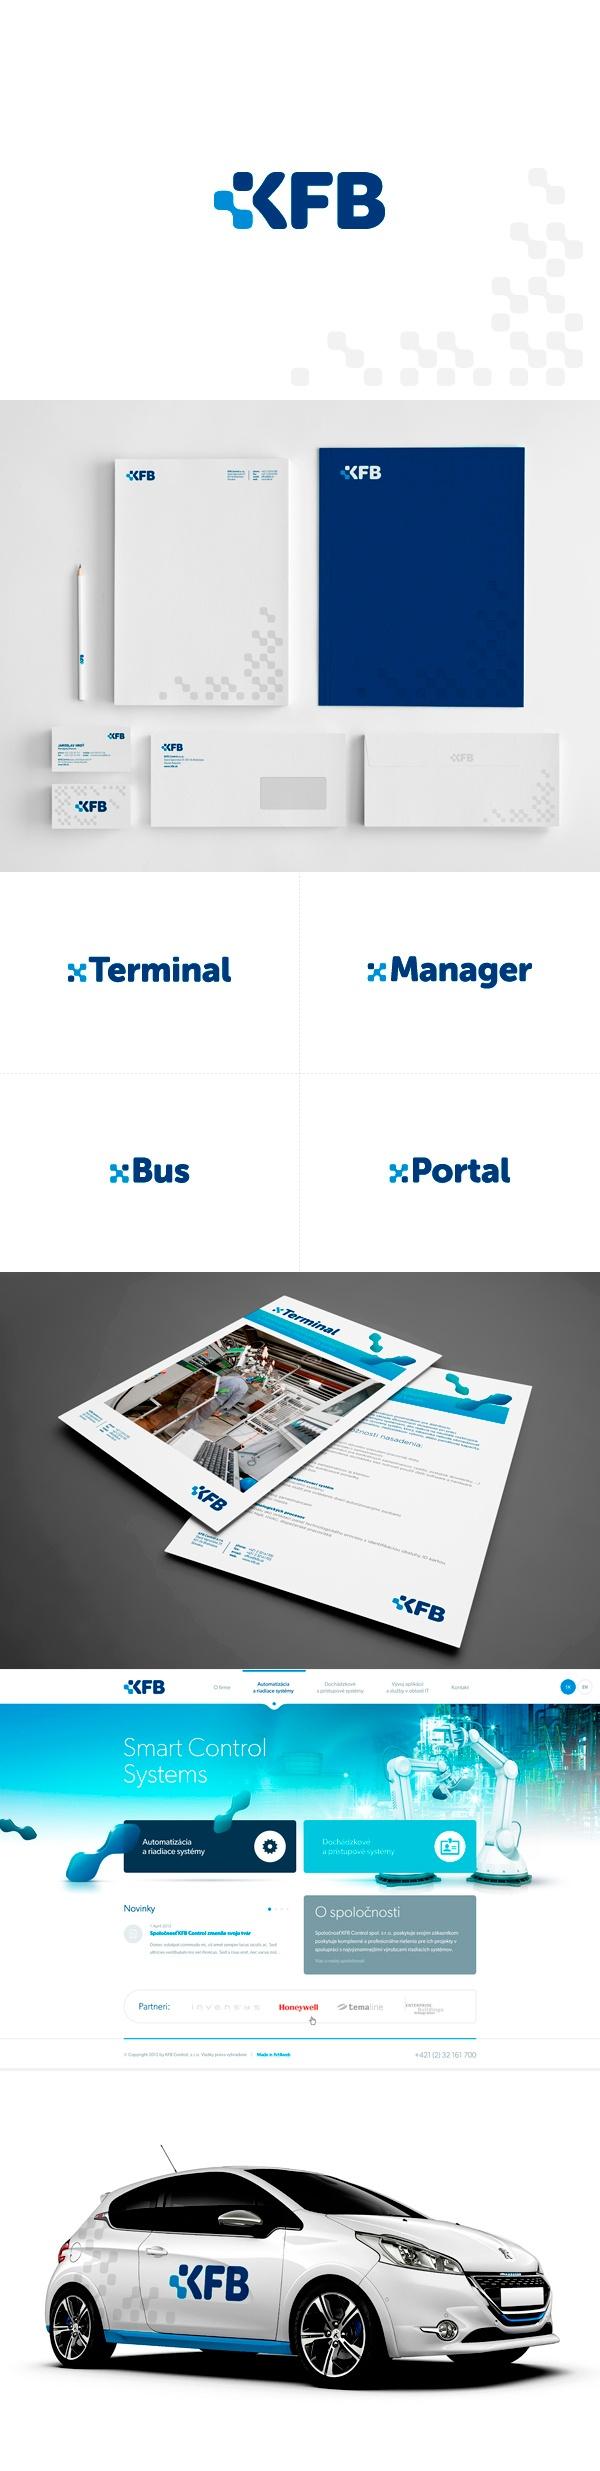 corporate ID / KFB | #stationary #corporate #design #corporatedesign #logo #identity #branding #marketing <<< repinned by an #advertising agency from #Hamburg / #Germany - www.BlickeDeeler.de | Follow us on www.facebook.com/BlickeDeeler